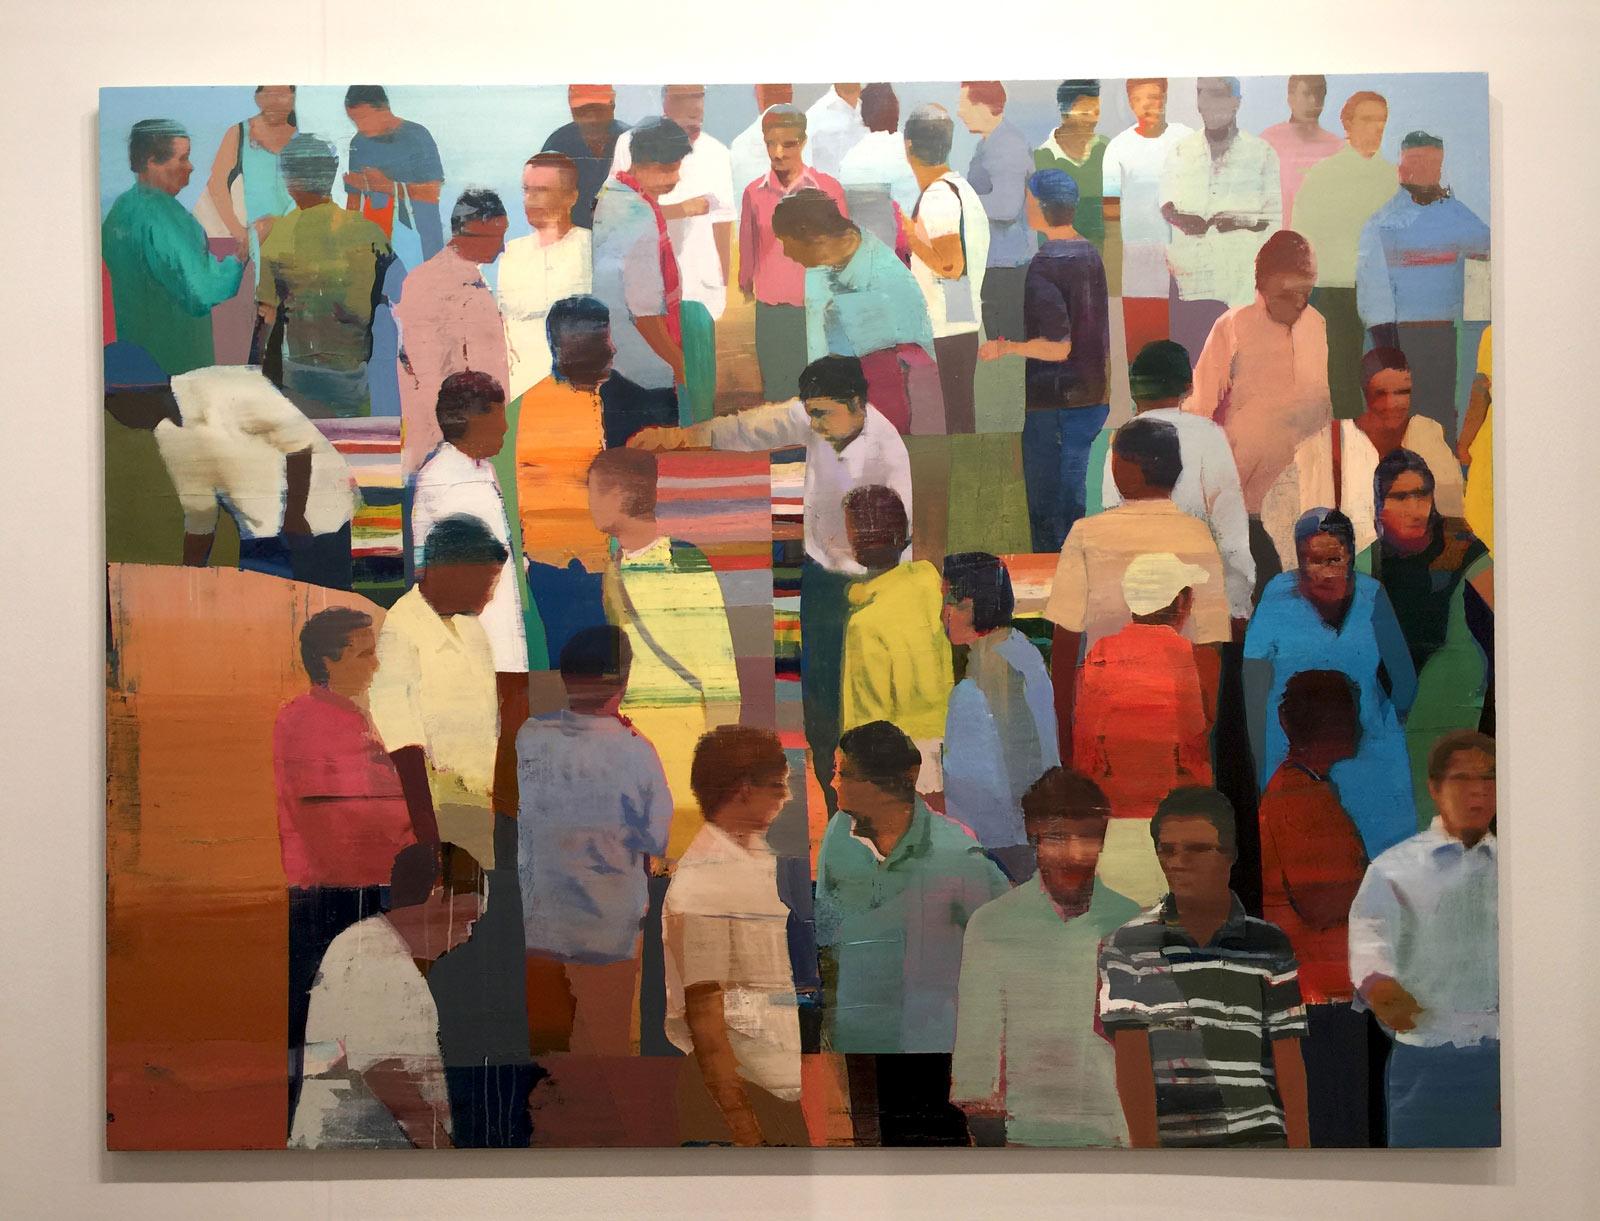 Suhas-Bhujbal-Market-5-oil-canvas-Andrea-Schwartz-Gallery.jpg